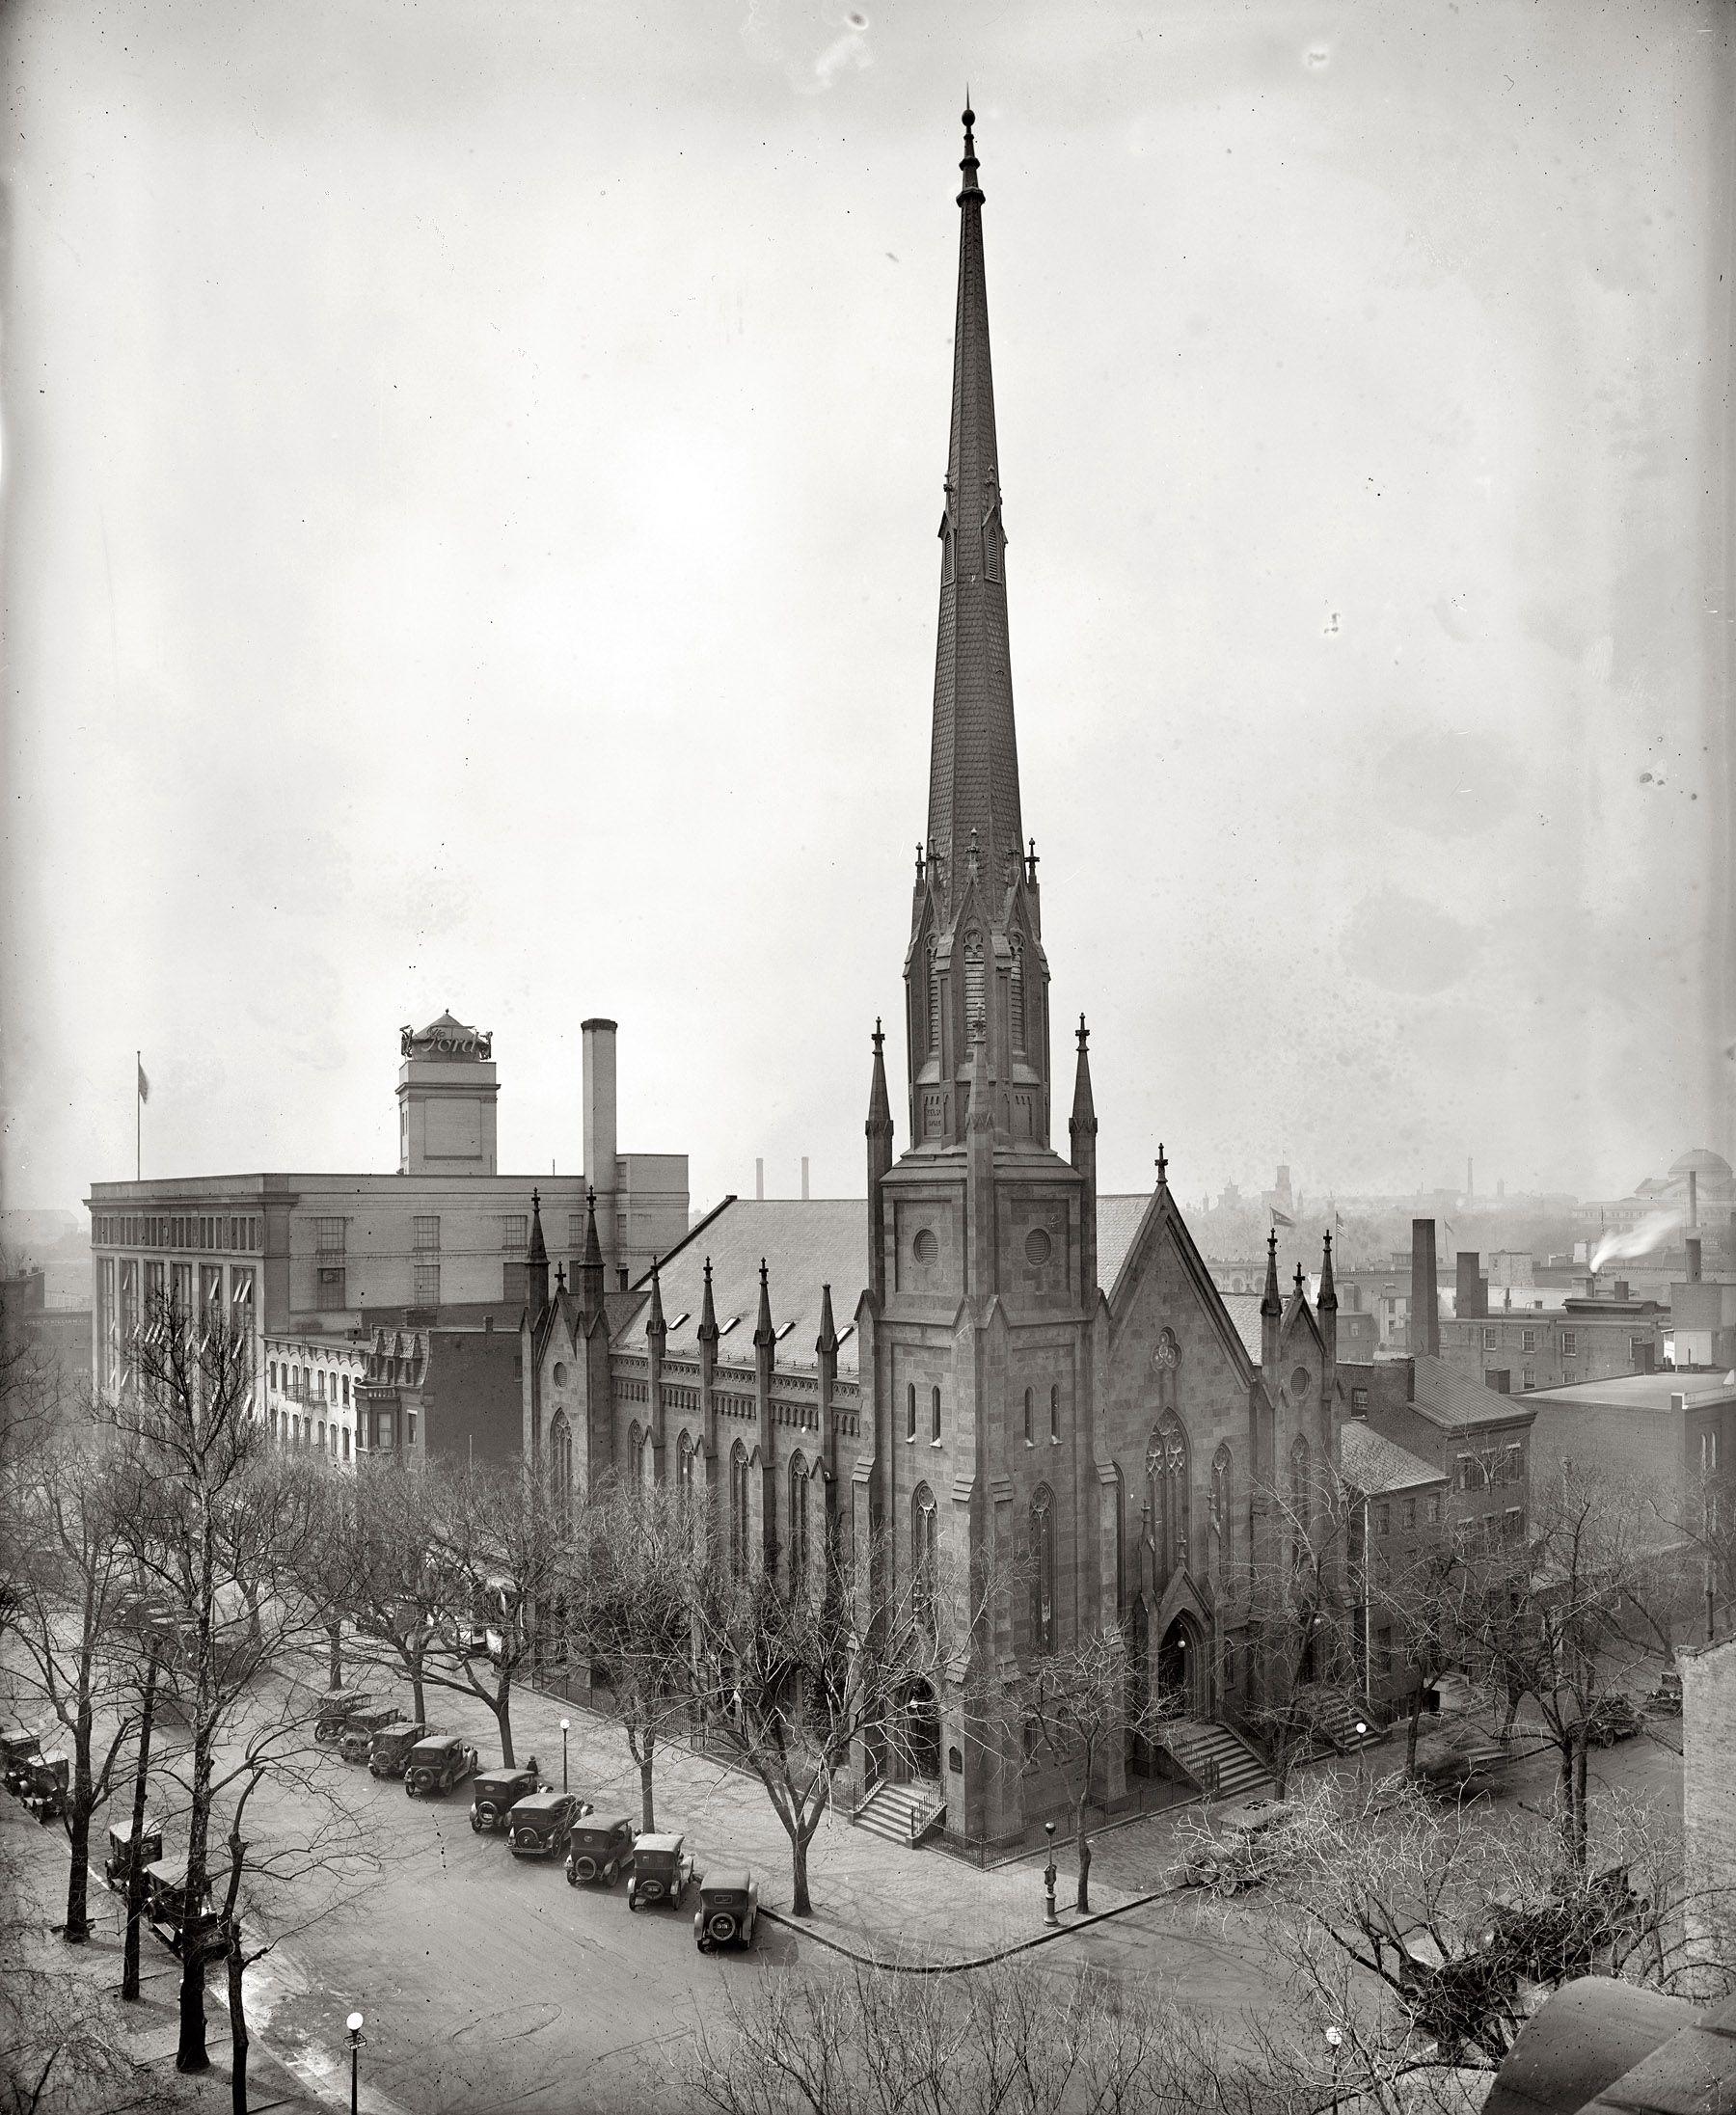 Metropolitan Methodist Church, C Street, Washington, D.C.